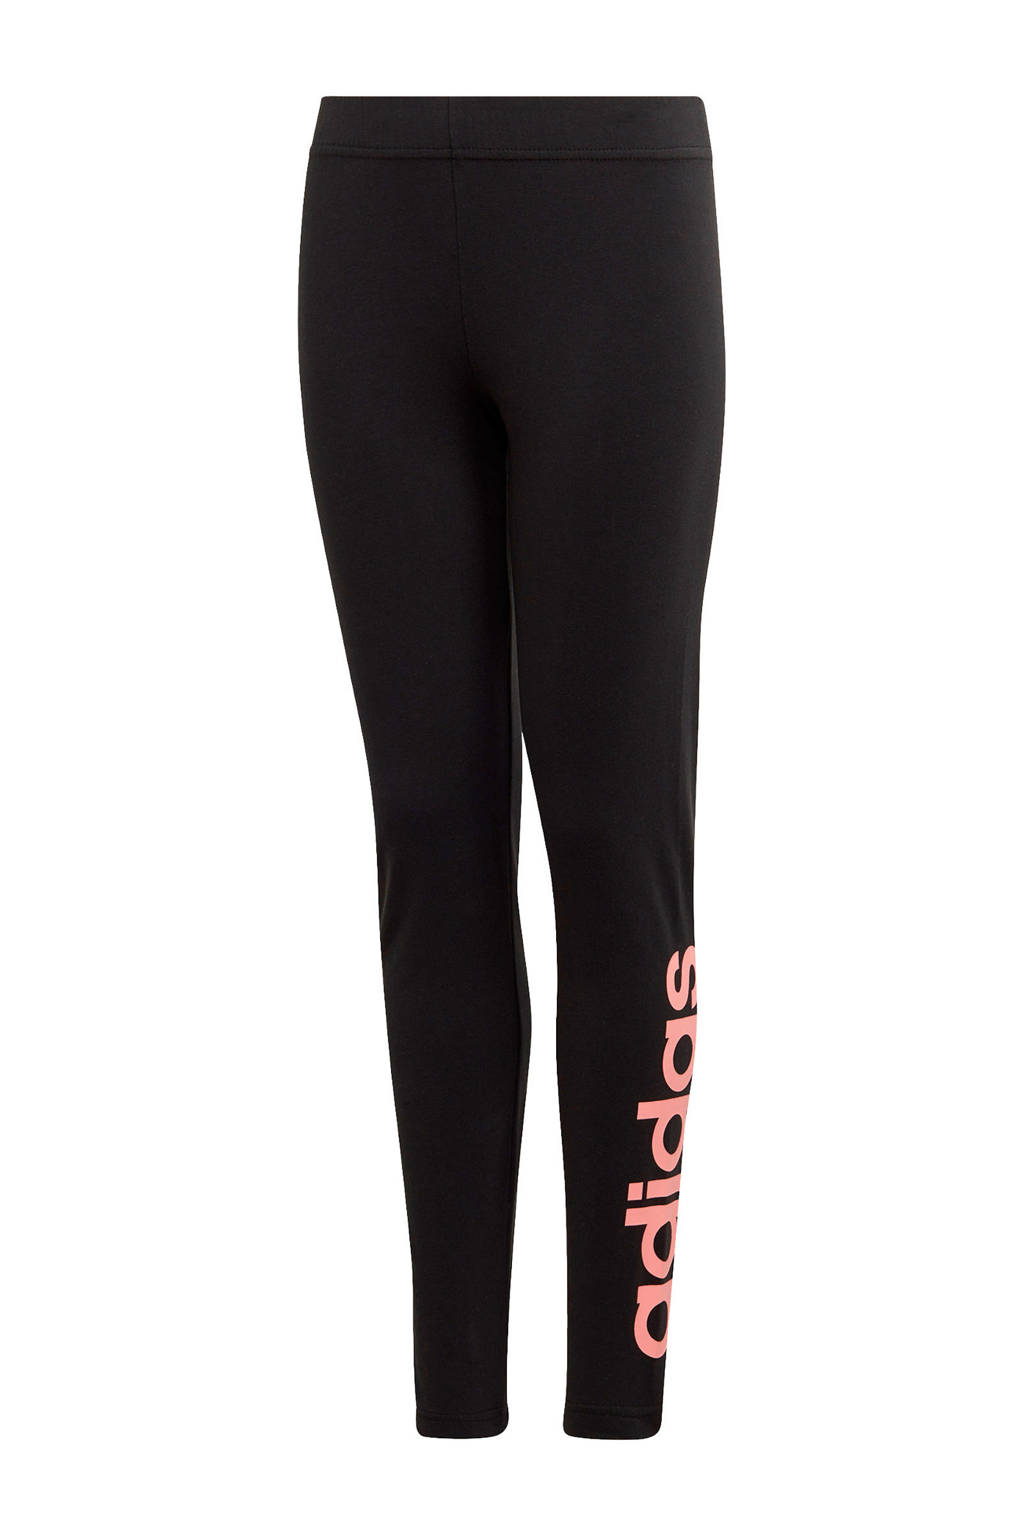 adidas Performance sportbroek zwart/koraalrood, Zwart/koraalrood